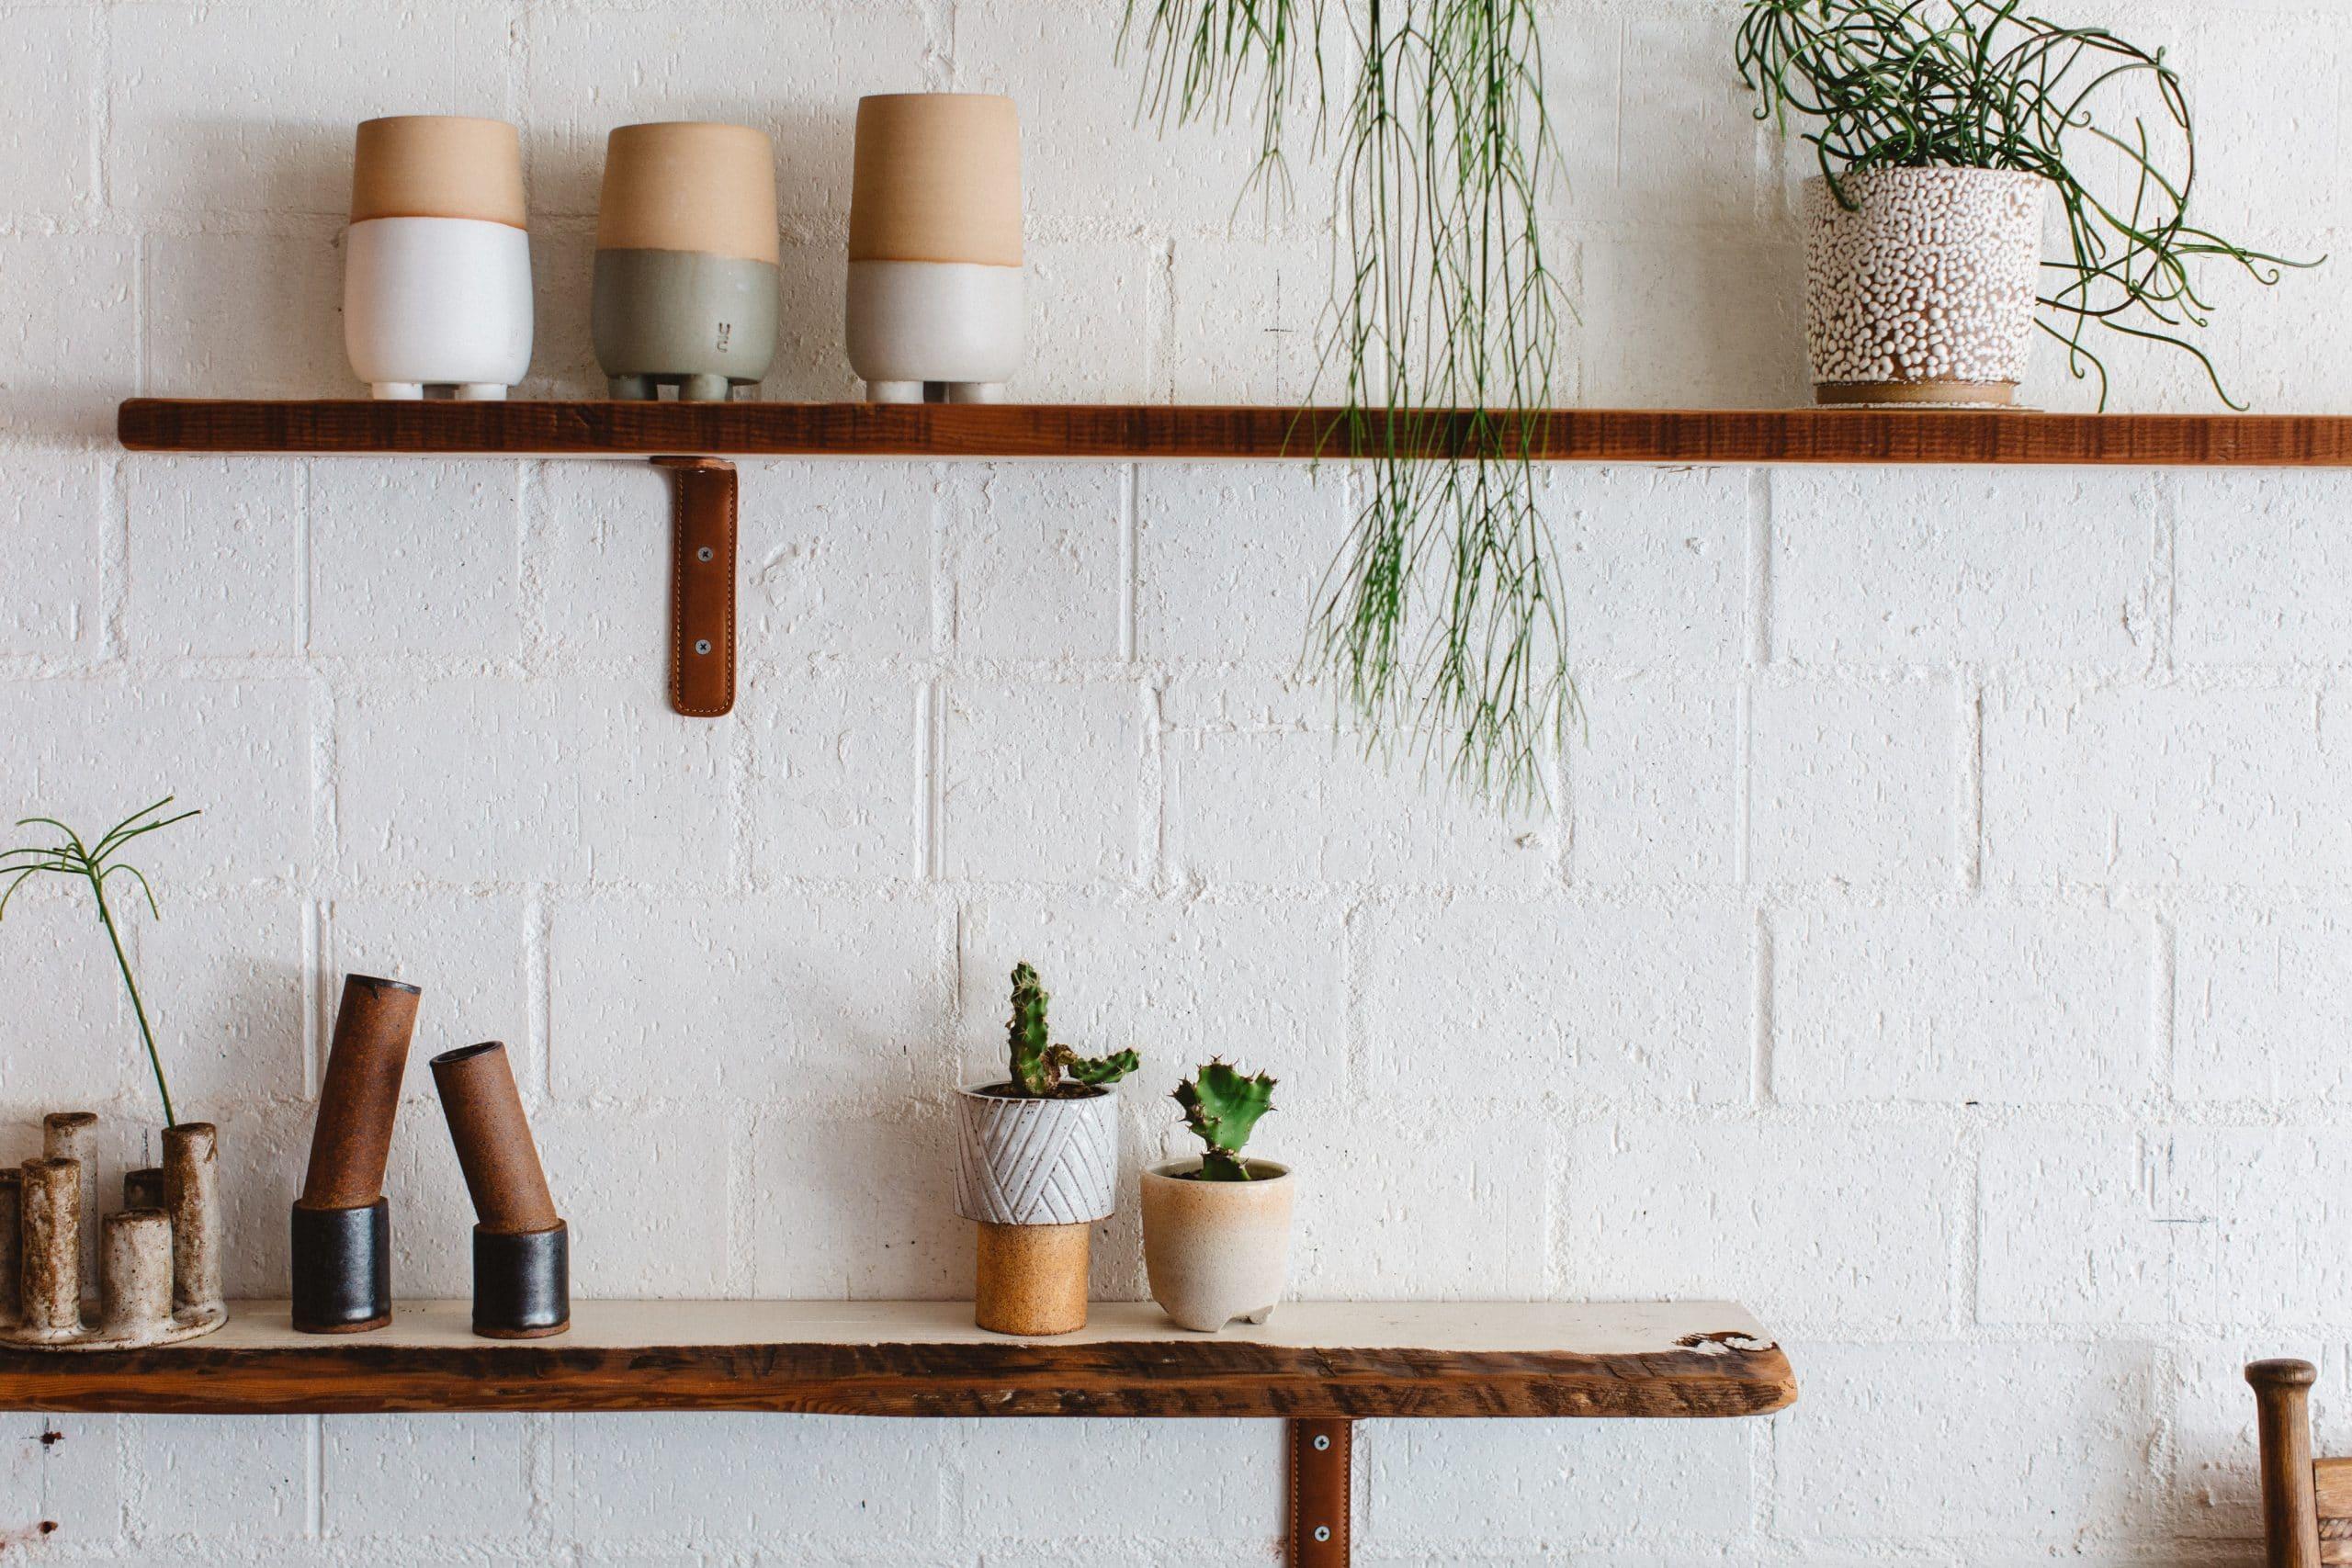 DIY : comment construire ses propres rangements ?